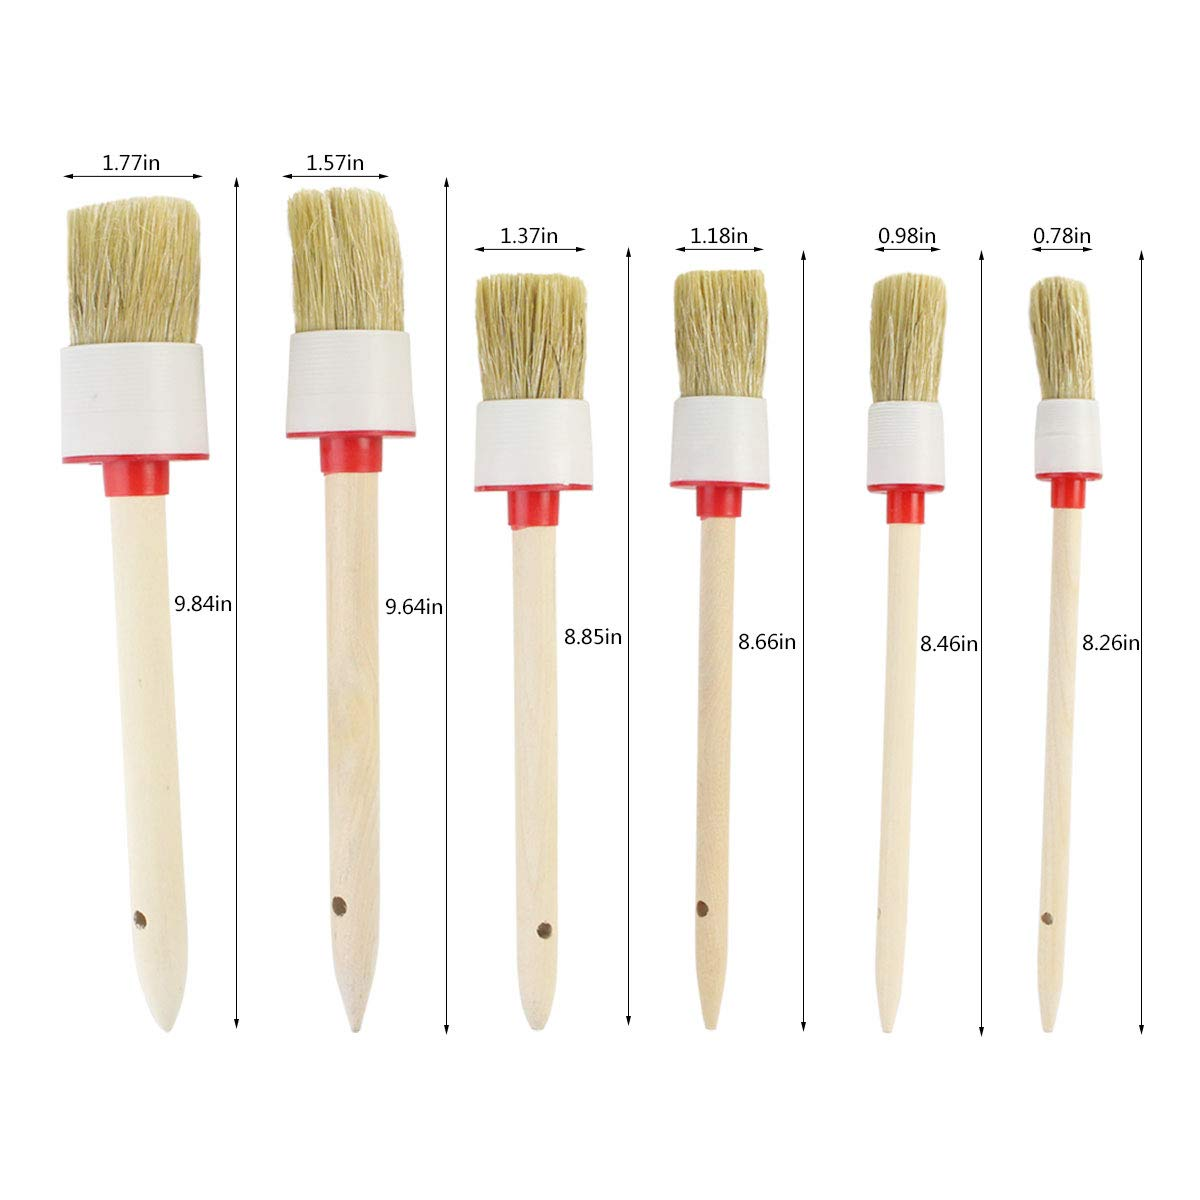 baotongle 12pcs Auto Detailing Brush Kit, Car Cleaning Brush Set Car Cleaning Tools Natural Hog Hair Brush Kit for Car Cleaning Vents, Dash, Trim, Seats, Wheels